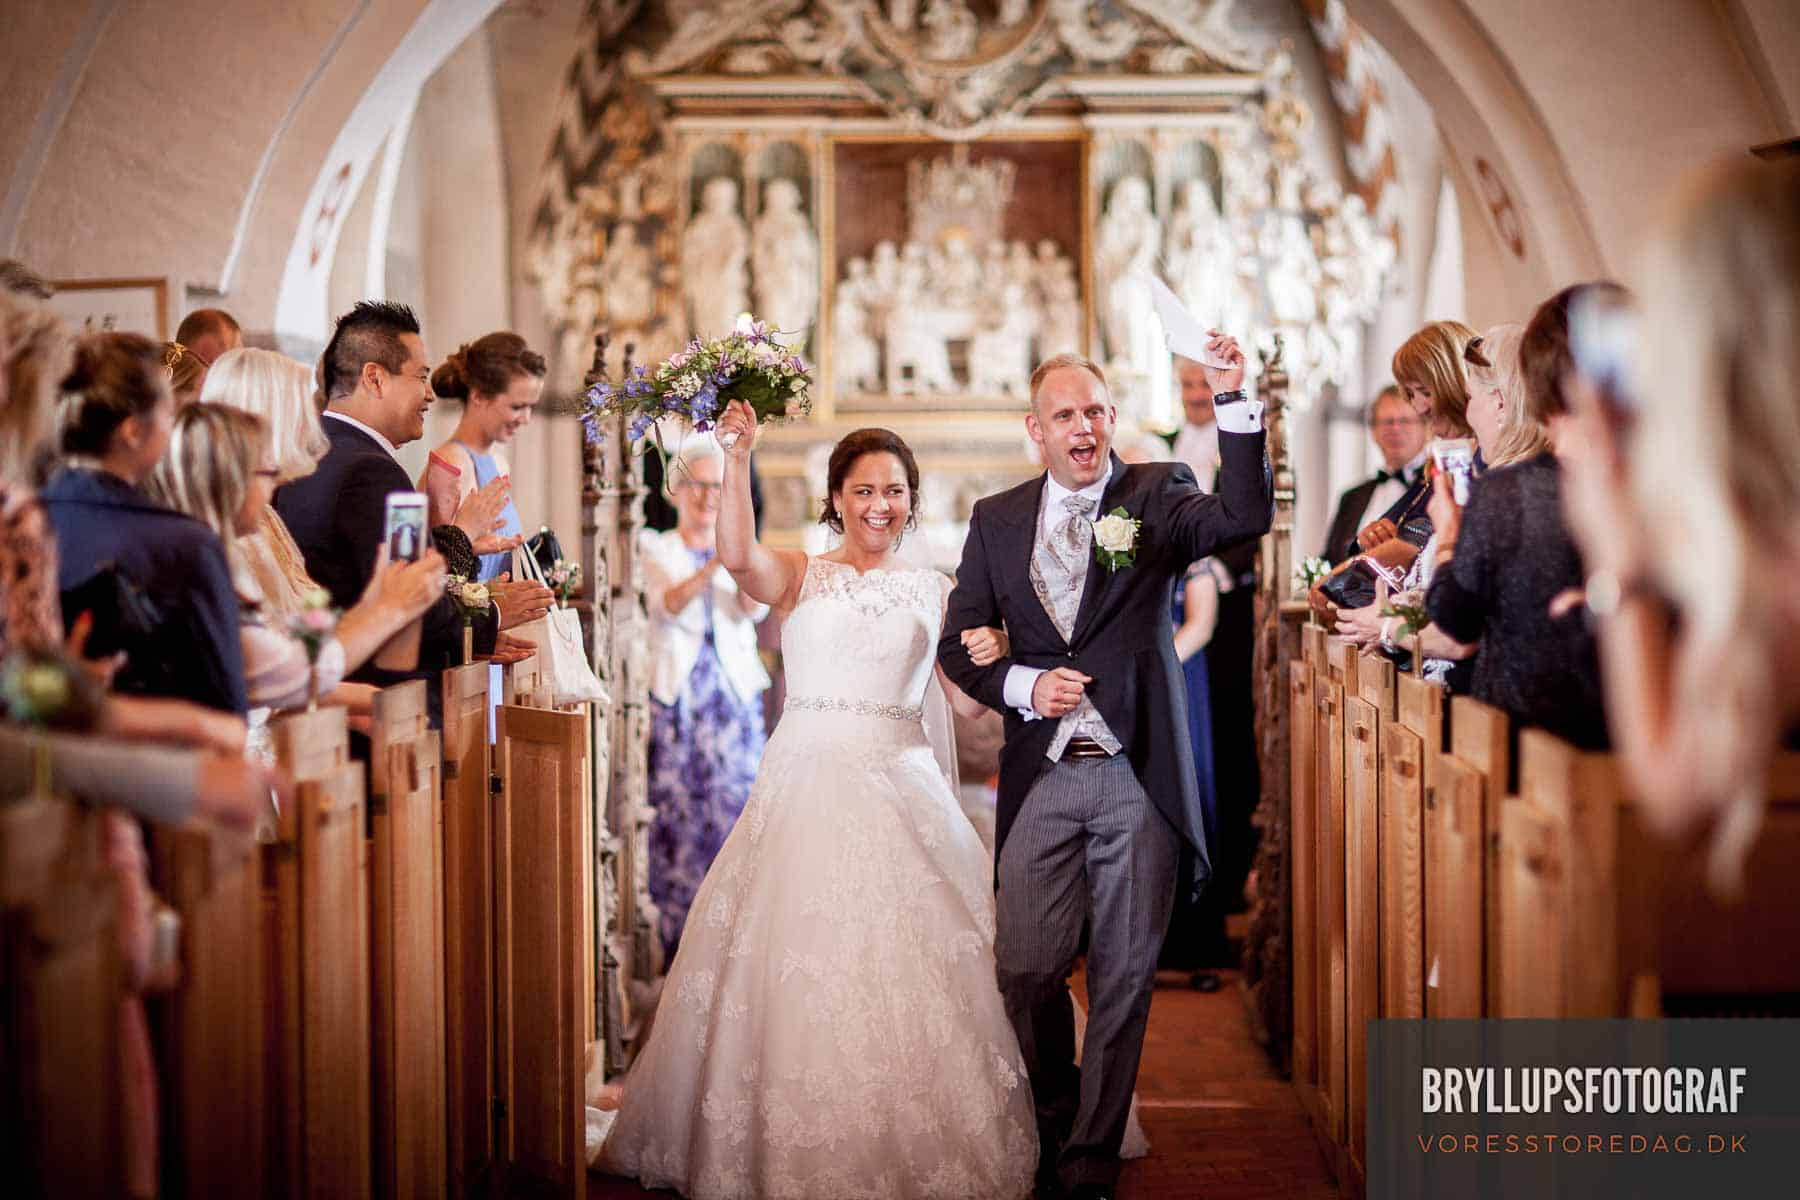 Wedding photographer - civil marriage in Ebeltoft